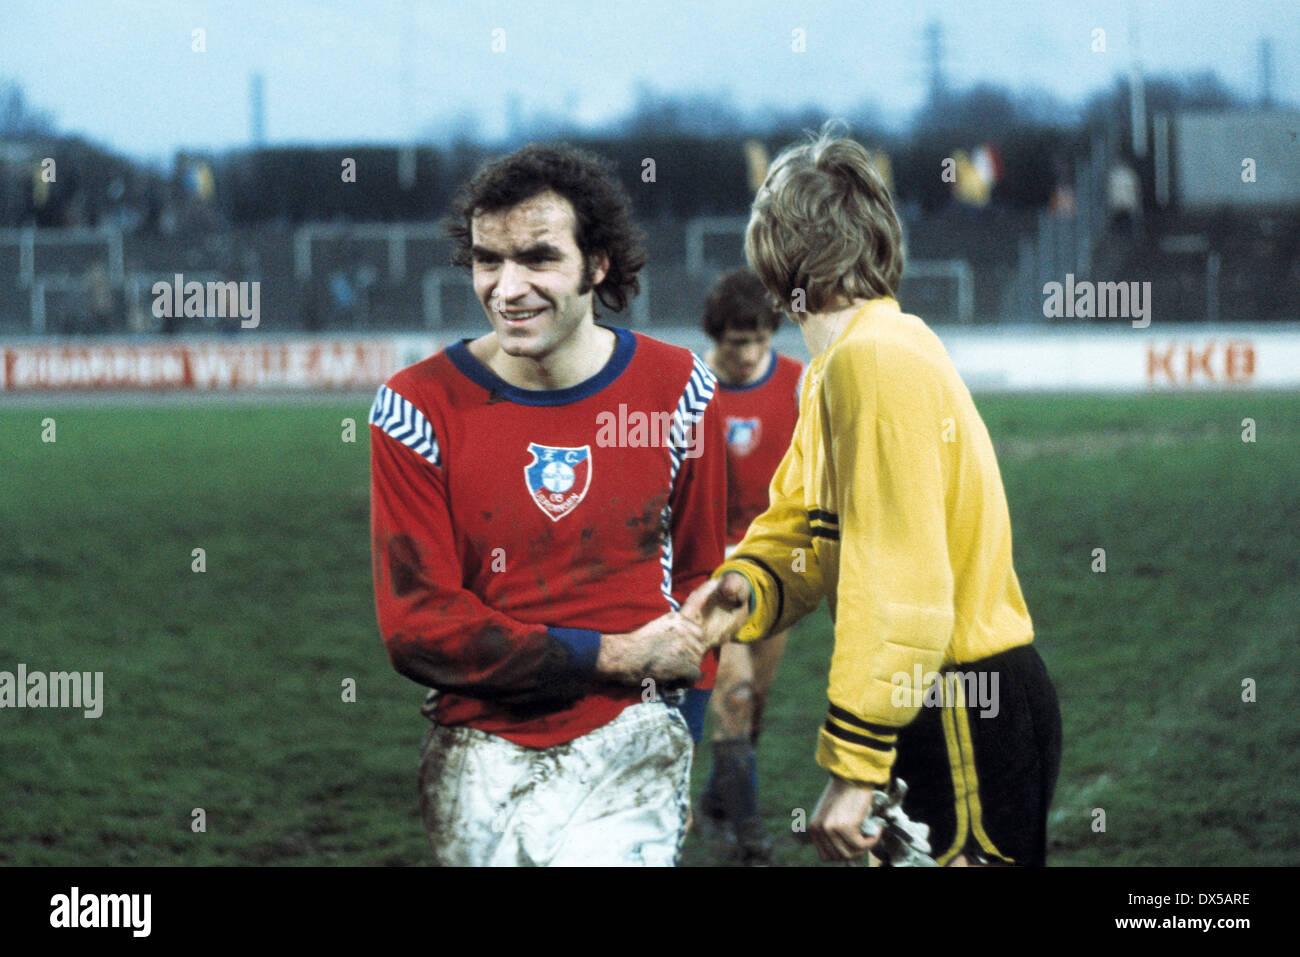 football, 2. Bundesliga Nord, 1974/1975, Niederrheinstadion, Rot Weiss Oberhausen versus FC Bayer 05 Uerdingen 1:3, end of the match, Heinz Mostert (Bayer) rejoicing at the win - Stock Image